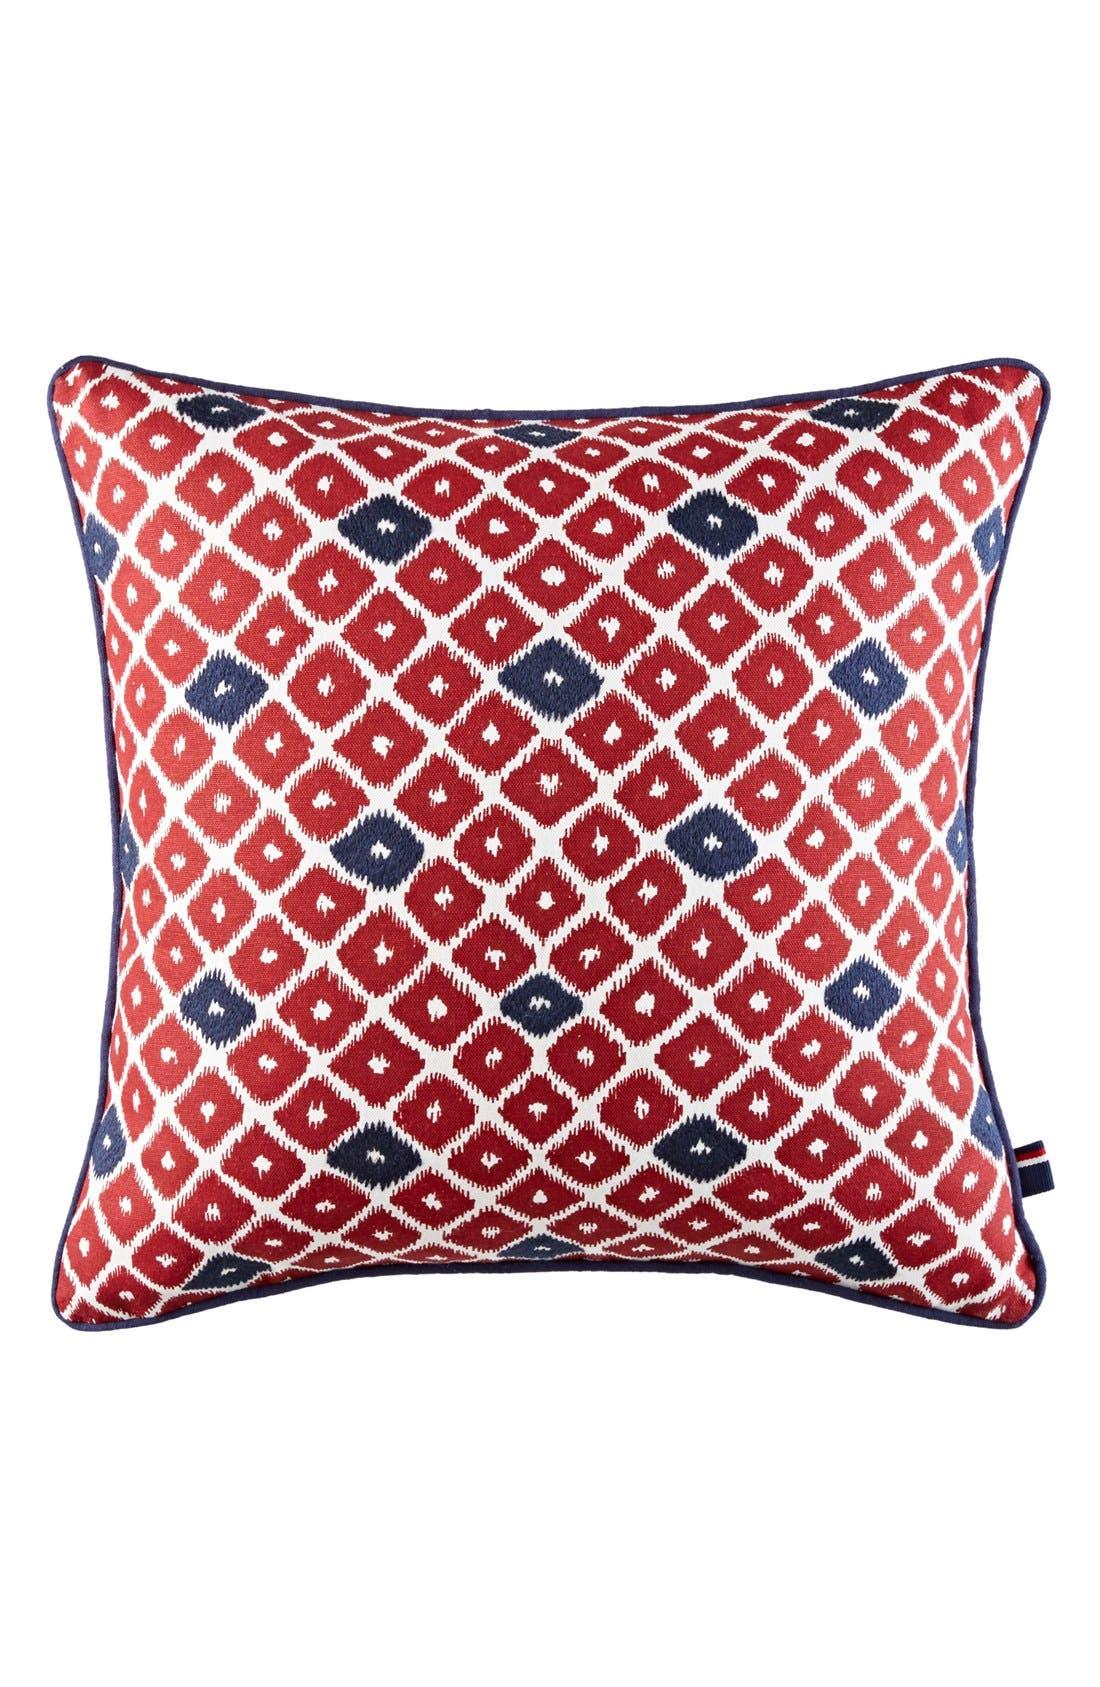 Alternate Image 1 Selected - Tommy Hilfiger Ellis Diamond Accent Pillow